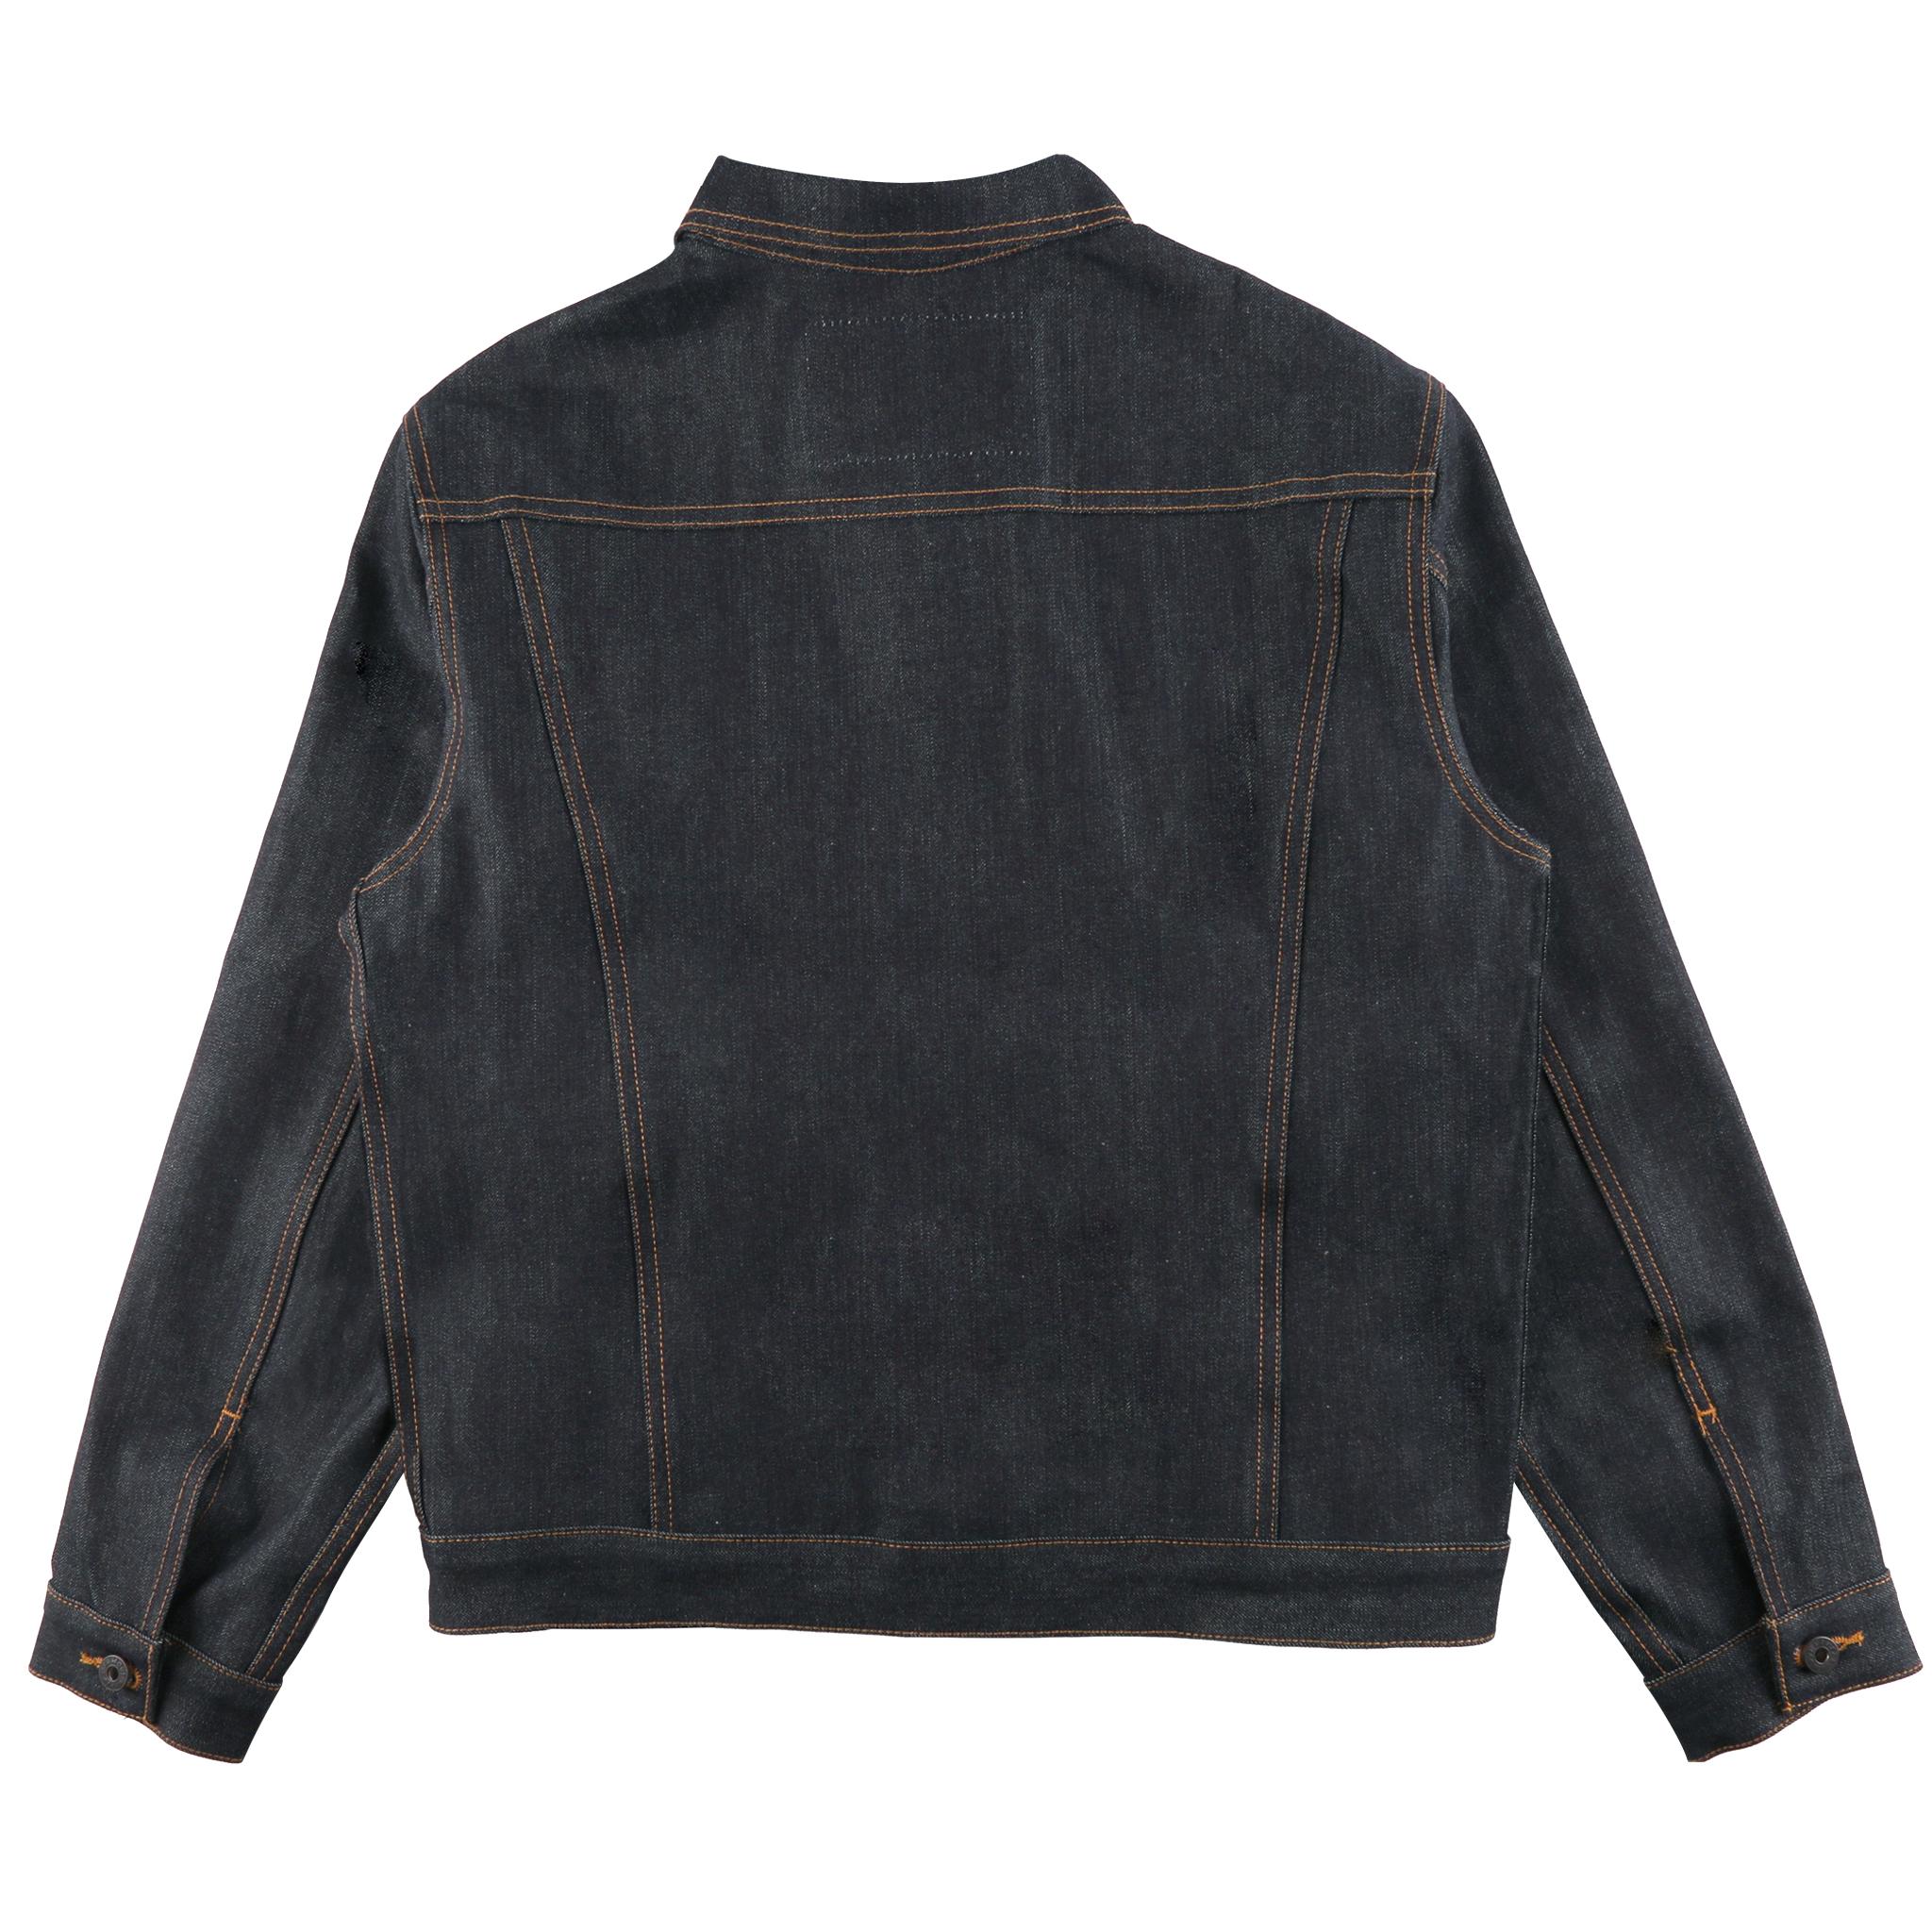 Guardian Selvedge Denim Jacket Back View